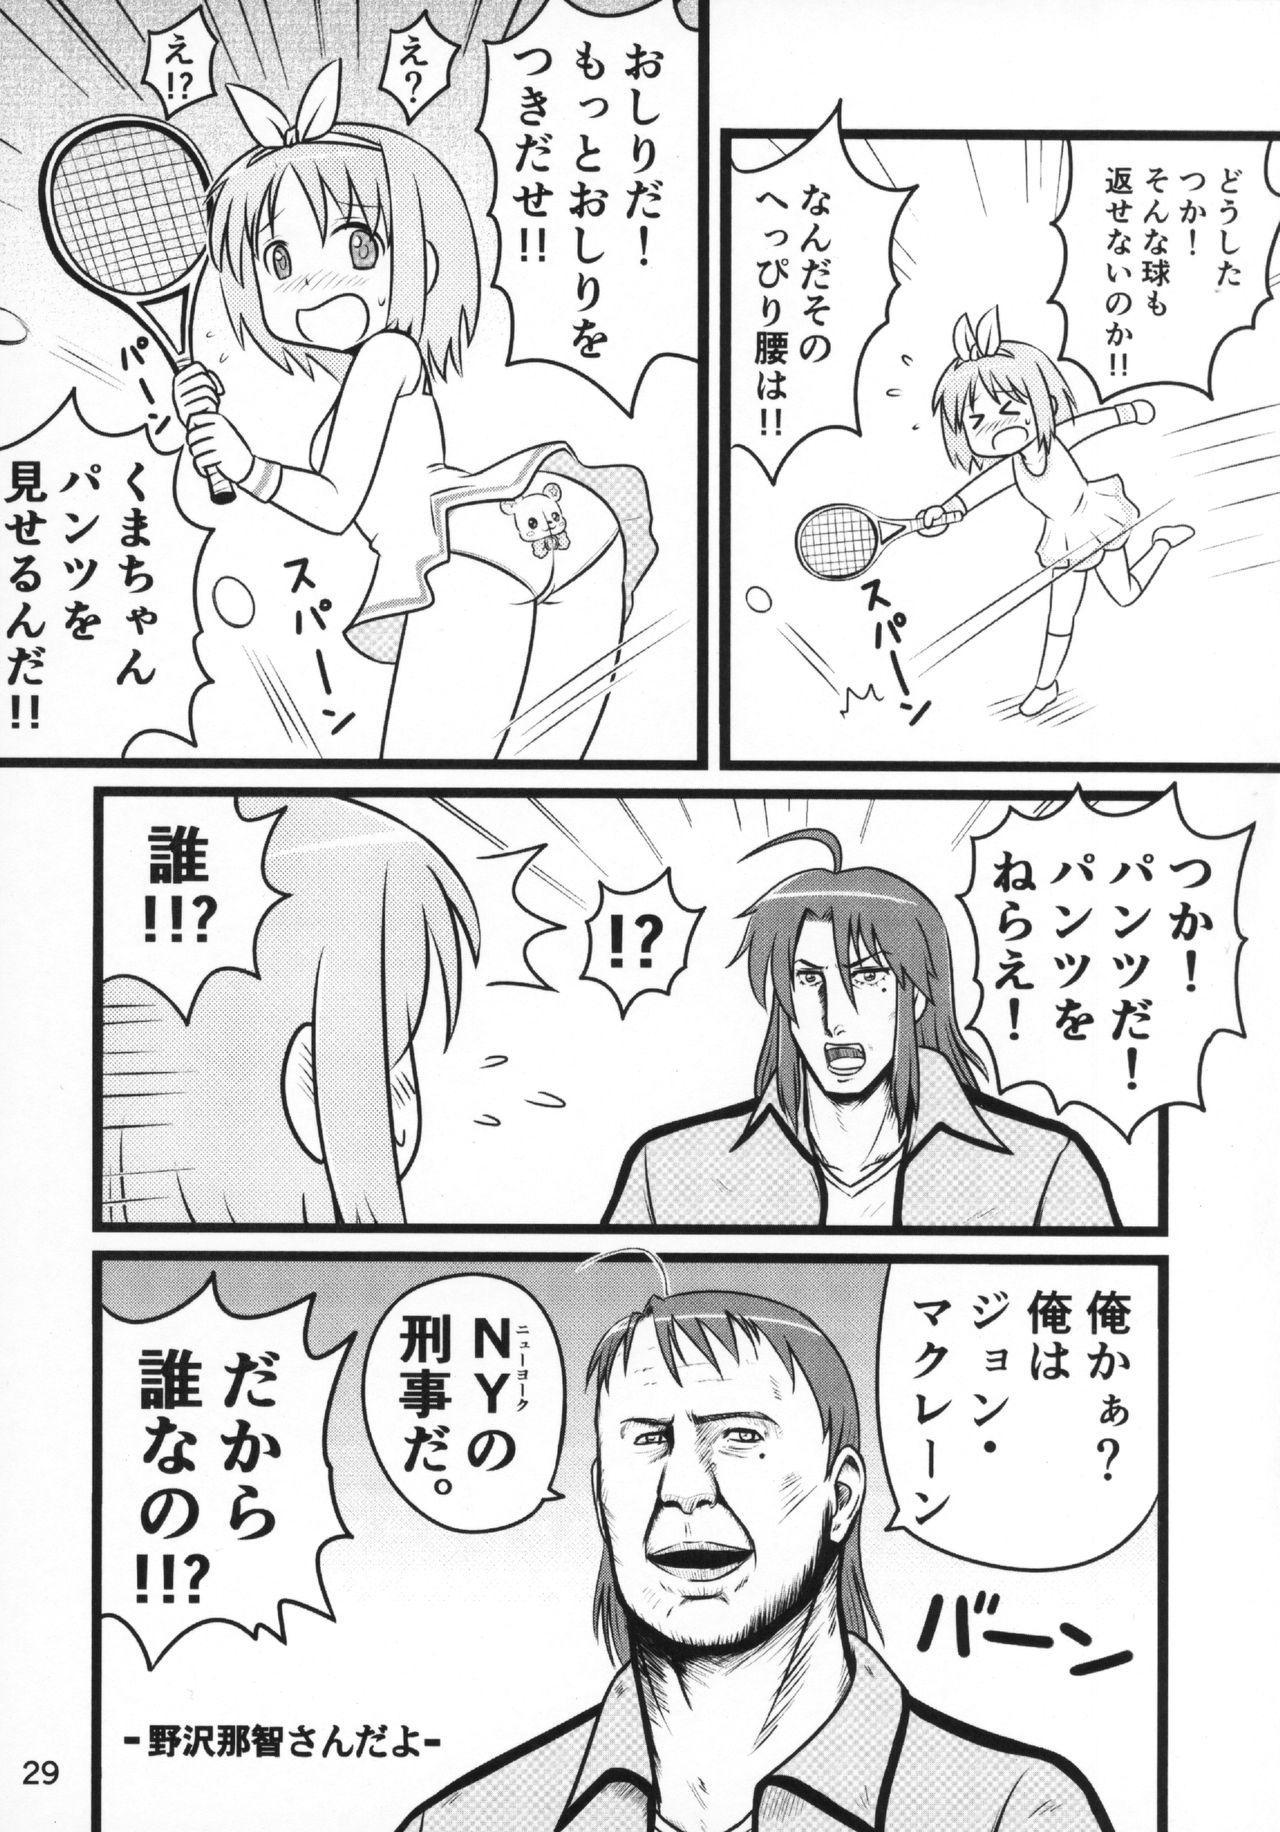 Kasukabe Pantsu Hunter 2017 27